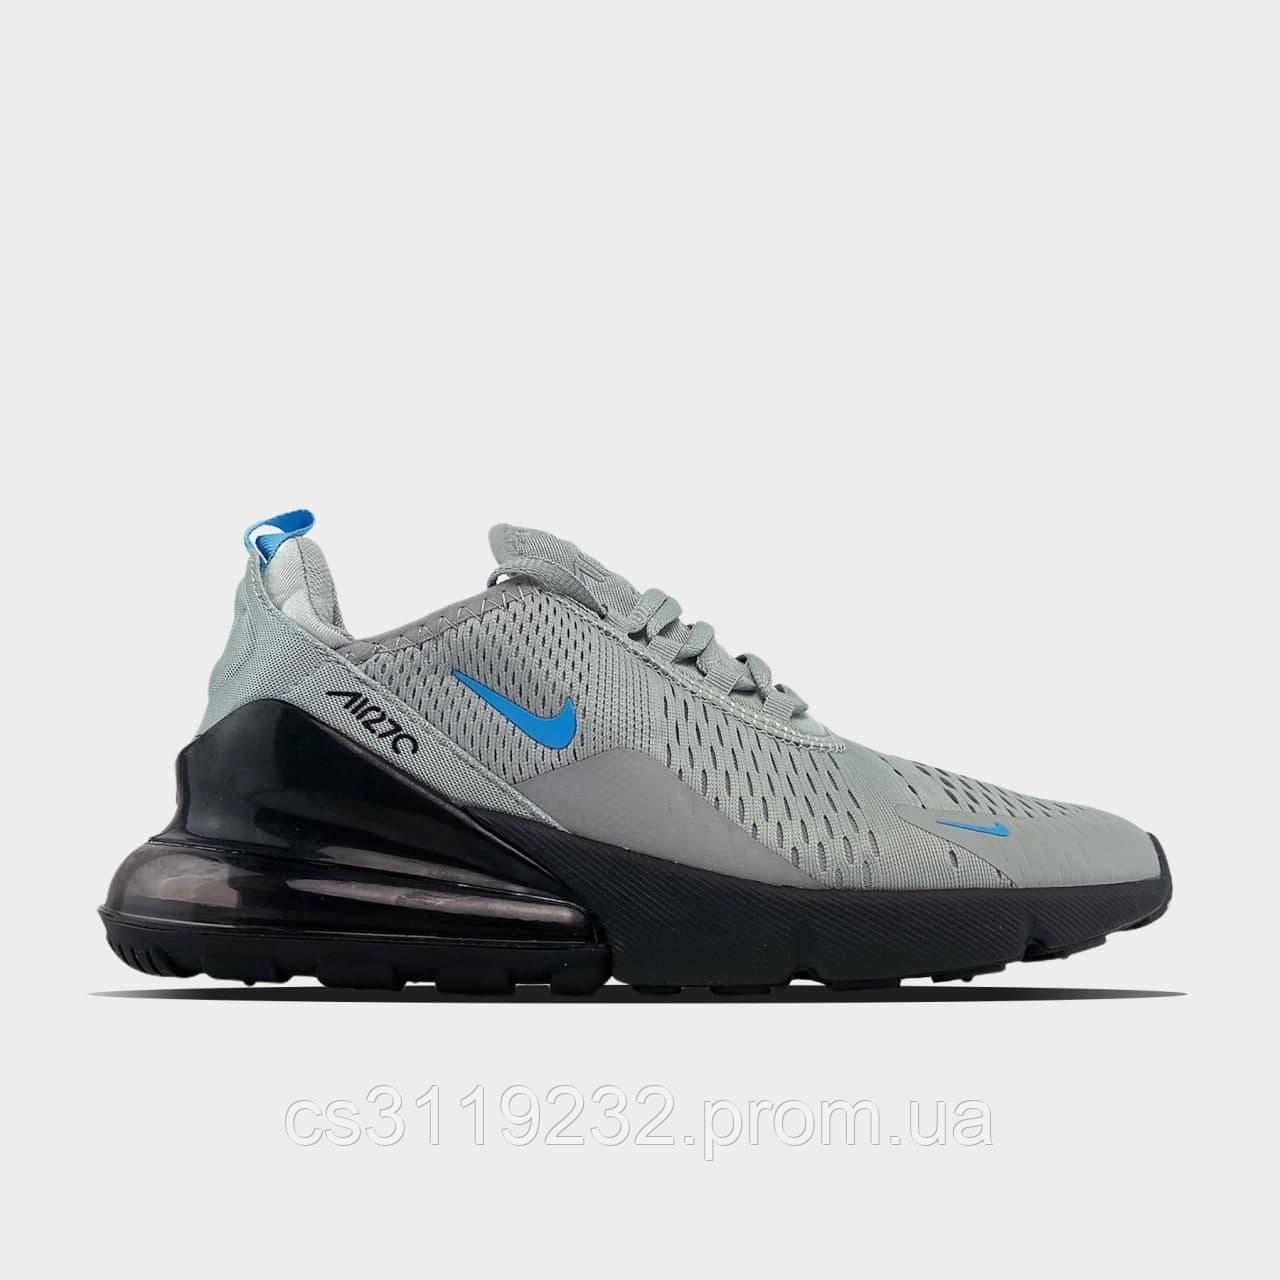 Мужские кроссовки  Nike Air Max 270 Cool Grey Blue Fury (серые)